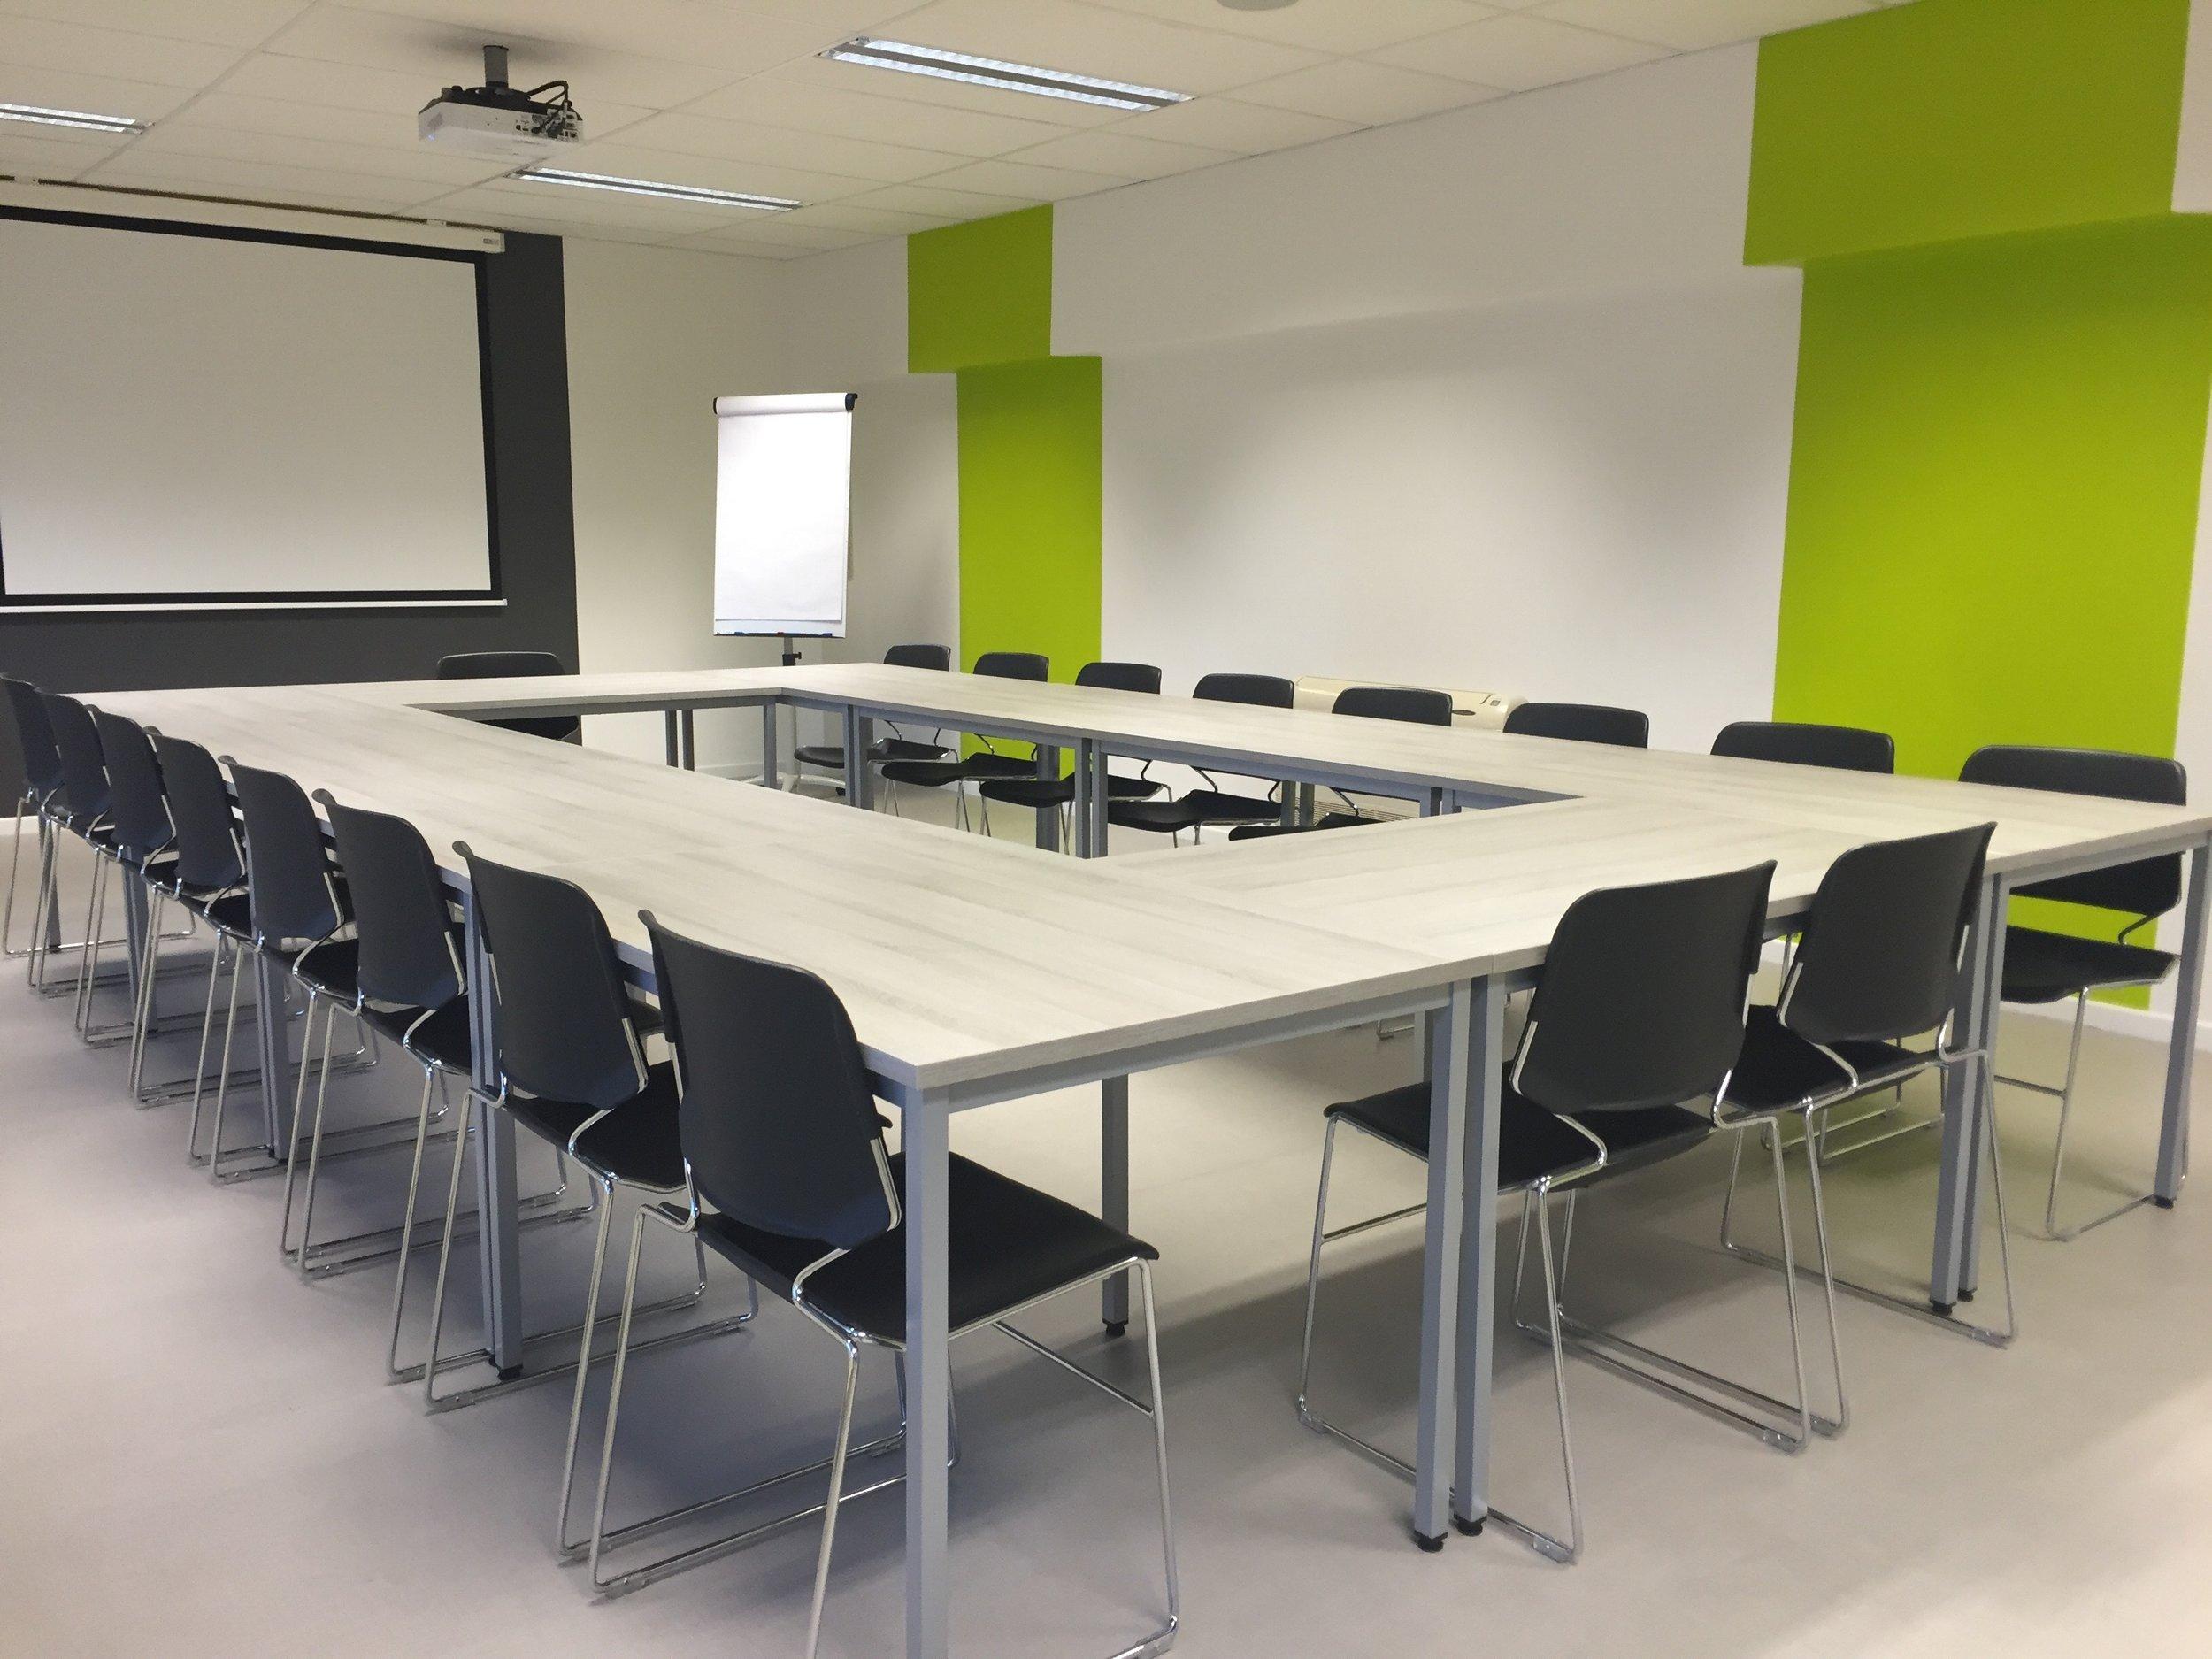 meeting-modern-room-conference-159805.jpeg